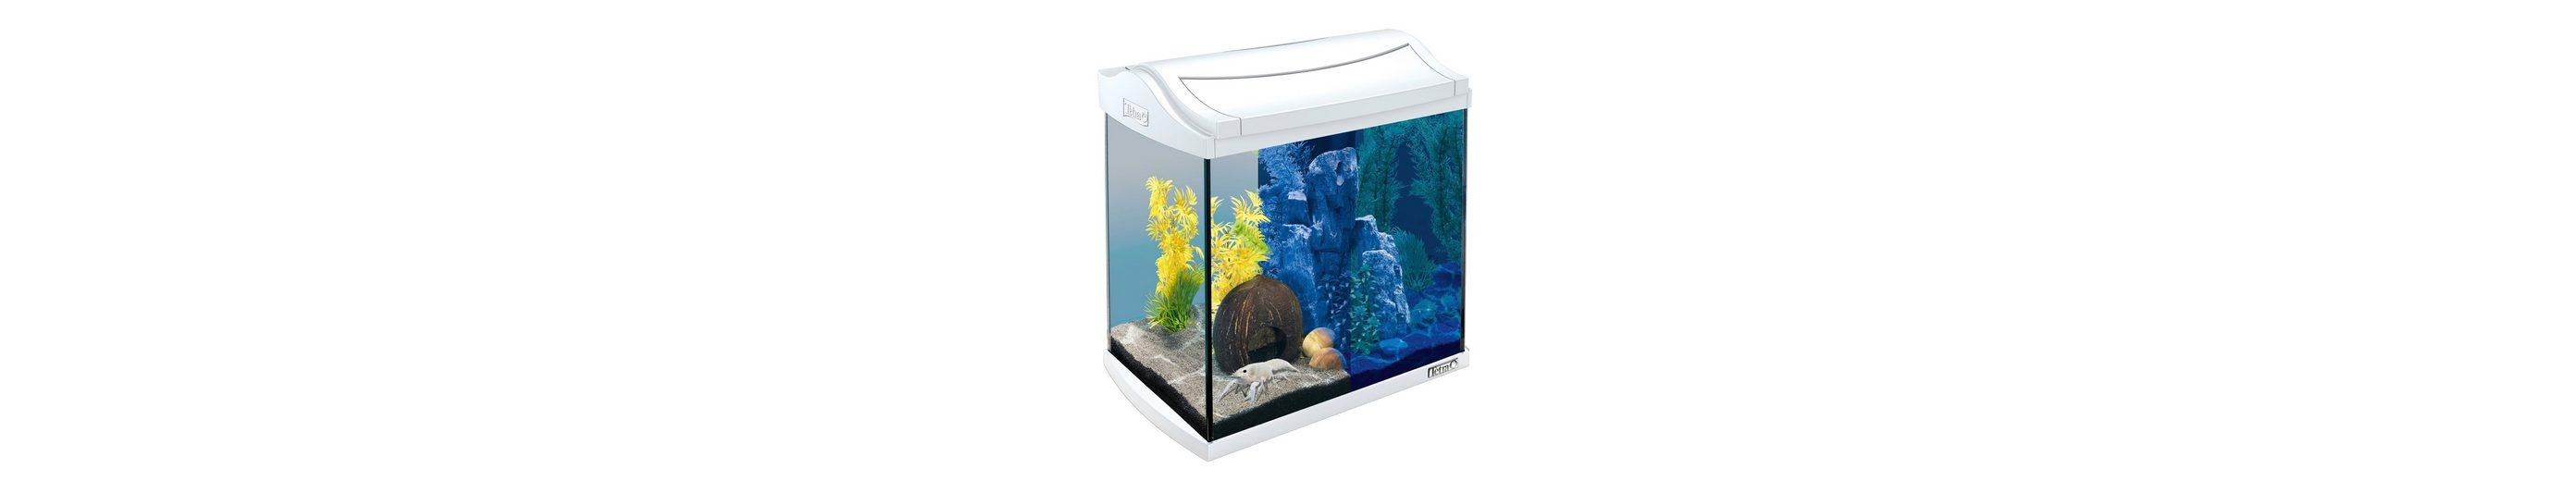 Aquarium »AquaArt LED Discovery Line« 30 l, weiß